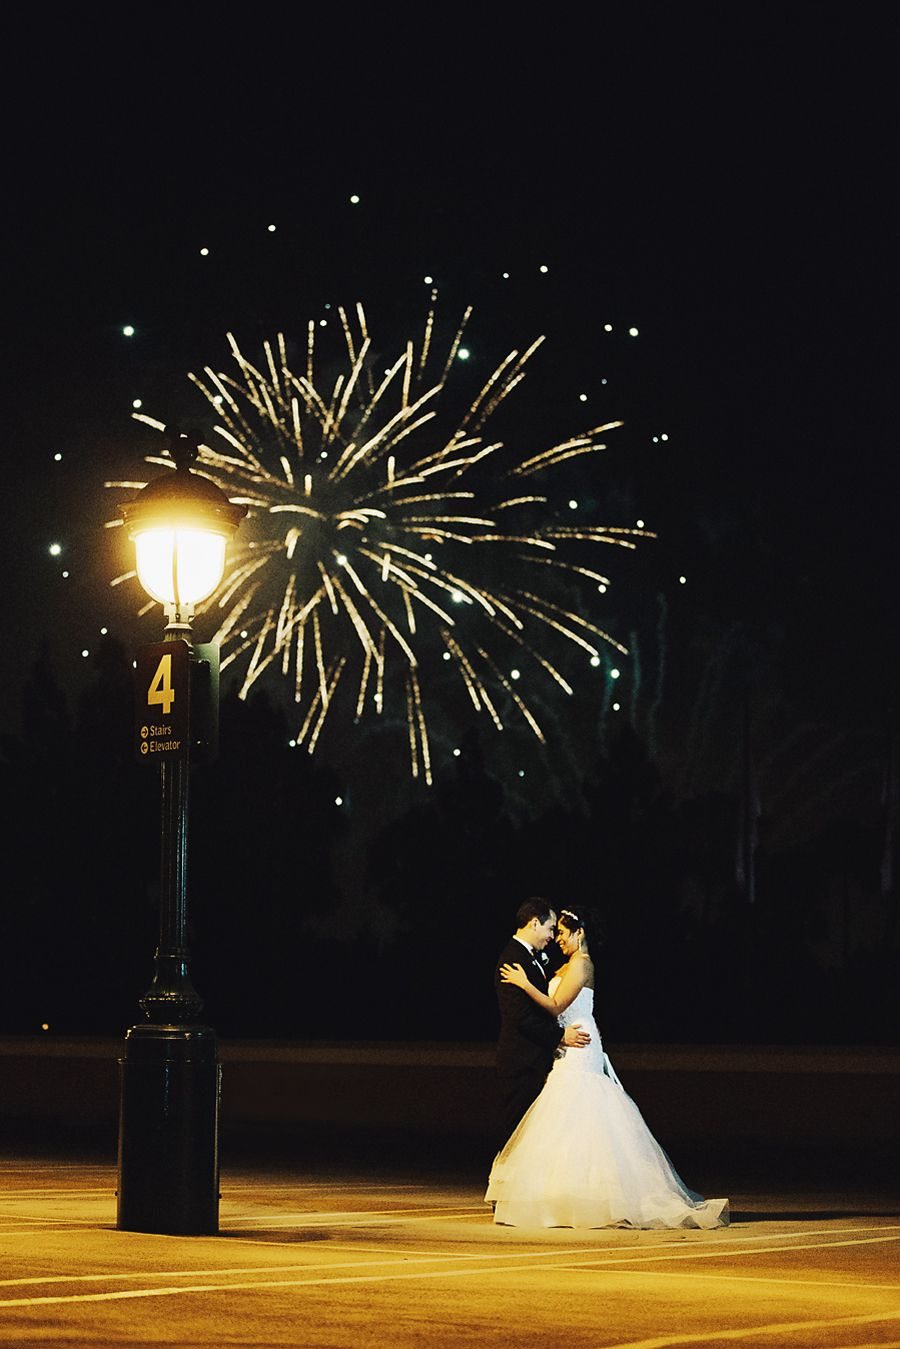 happy 4th of july fireworks disneyland disney holidays wedding fireworks wedding. Black Bedroom Furniture Sets. Home Design Ideas